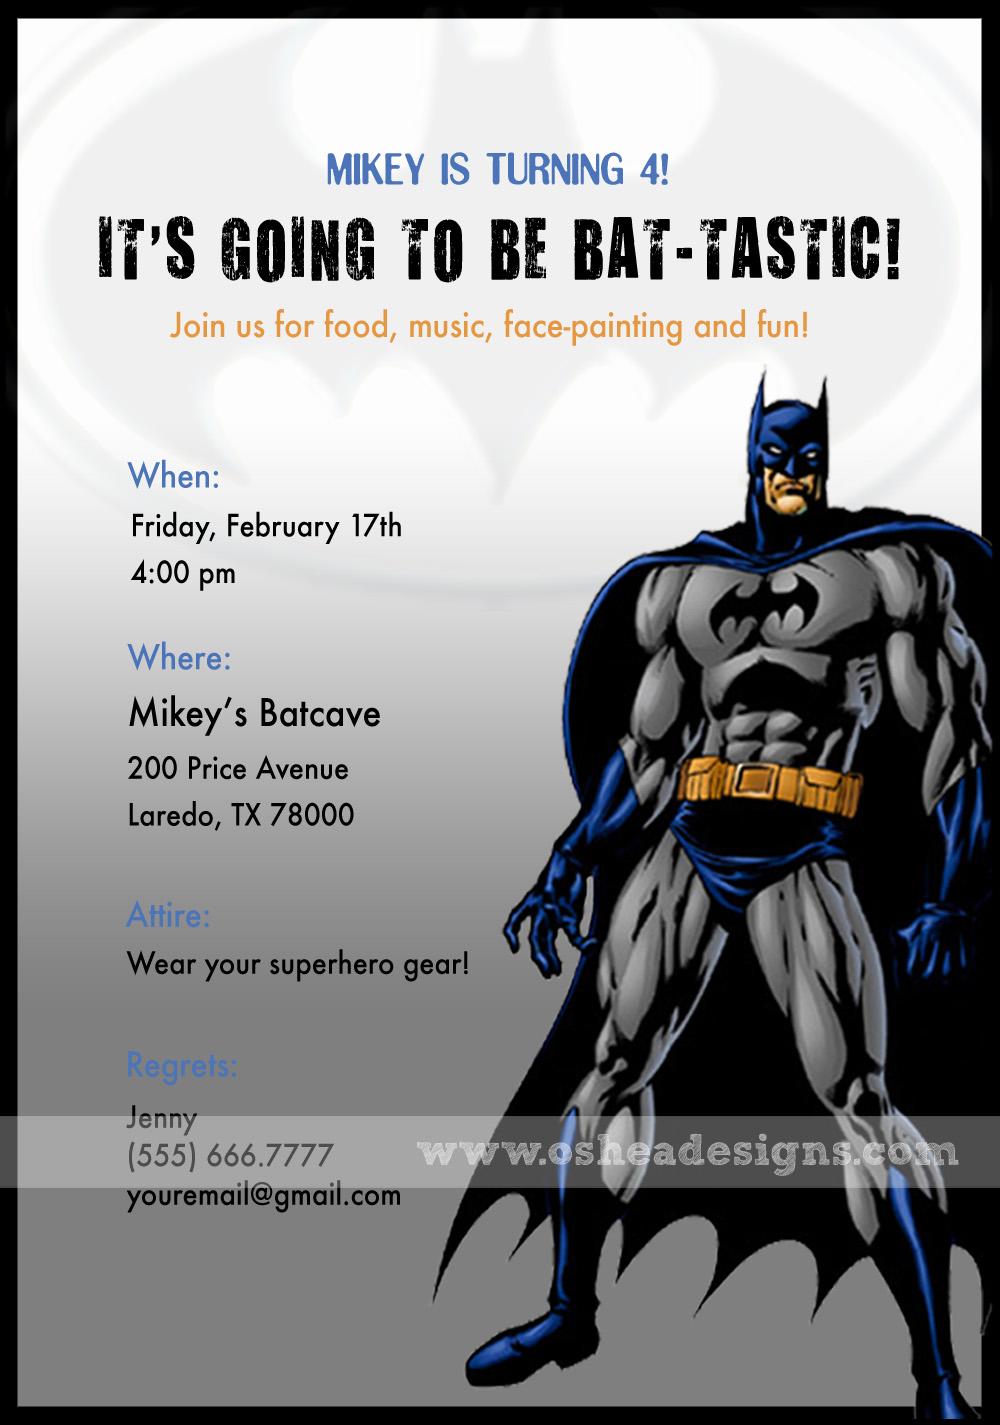 OSHEA DESIGNS - Customized Paper Goodies: Bat-tastic Batman ...